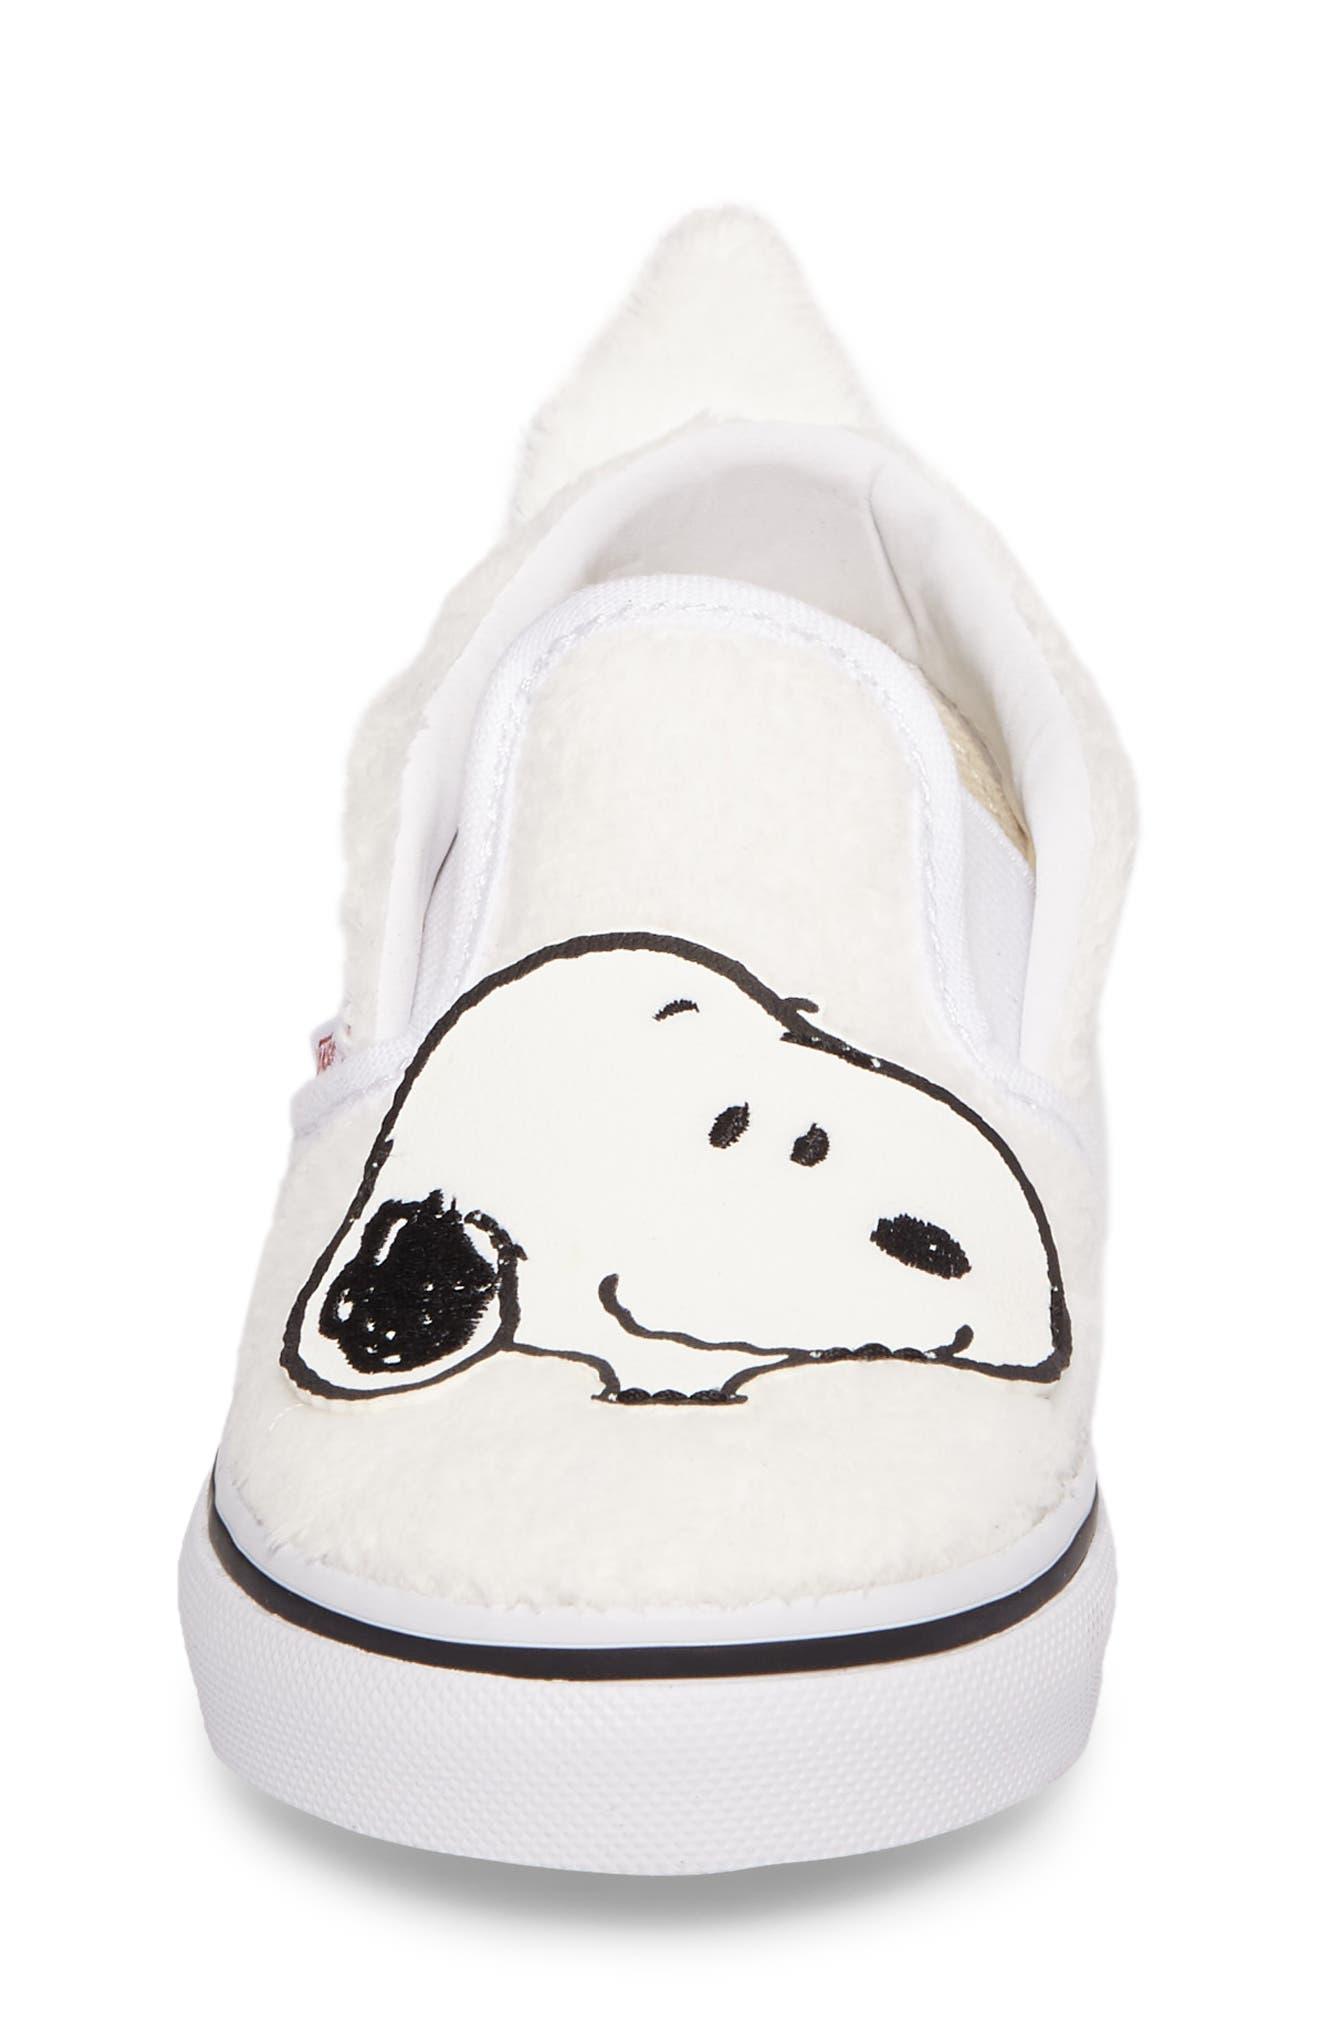 x Peanuts Slip-On Sneaker,                             Alternate thumbnail 4, color,                             100